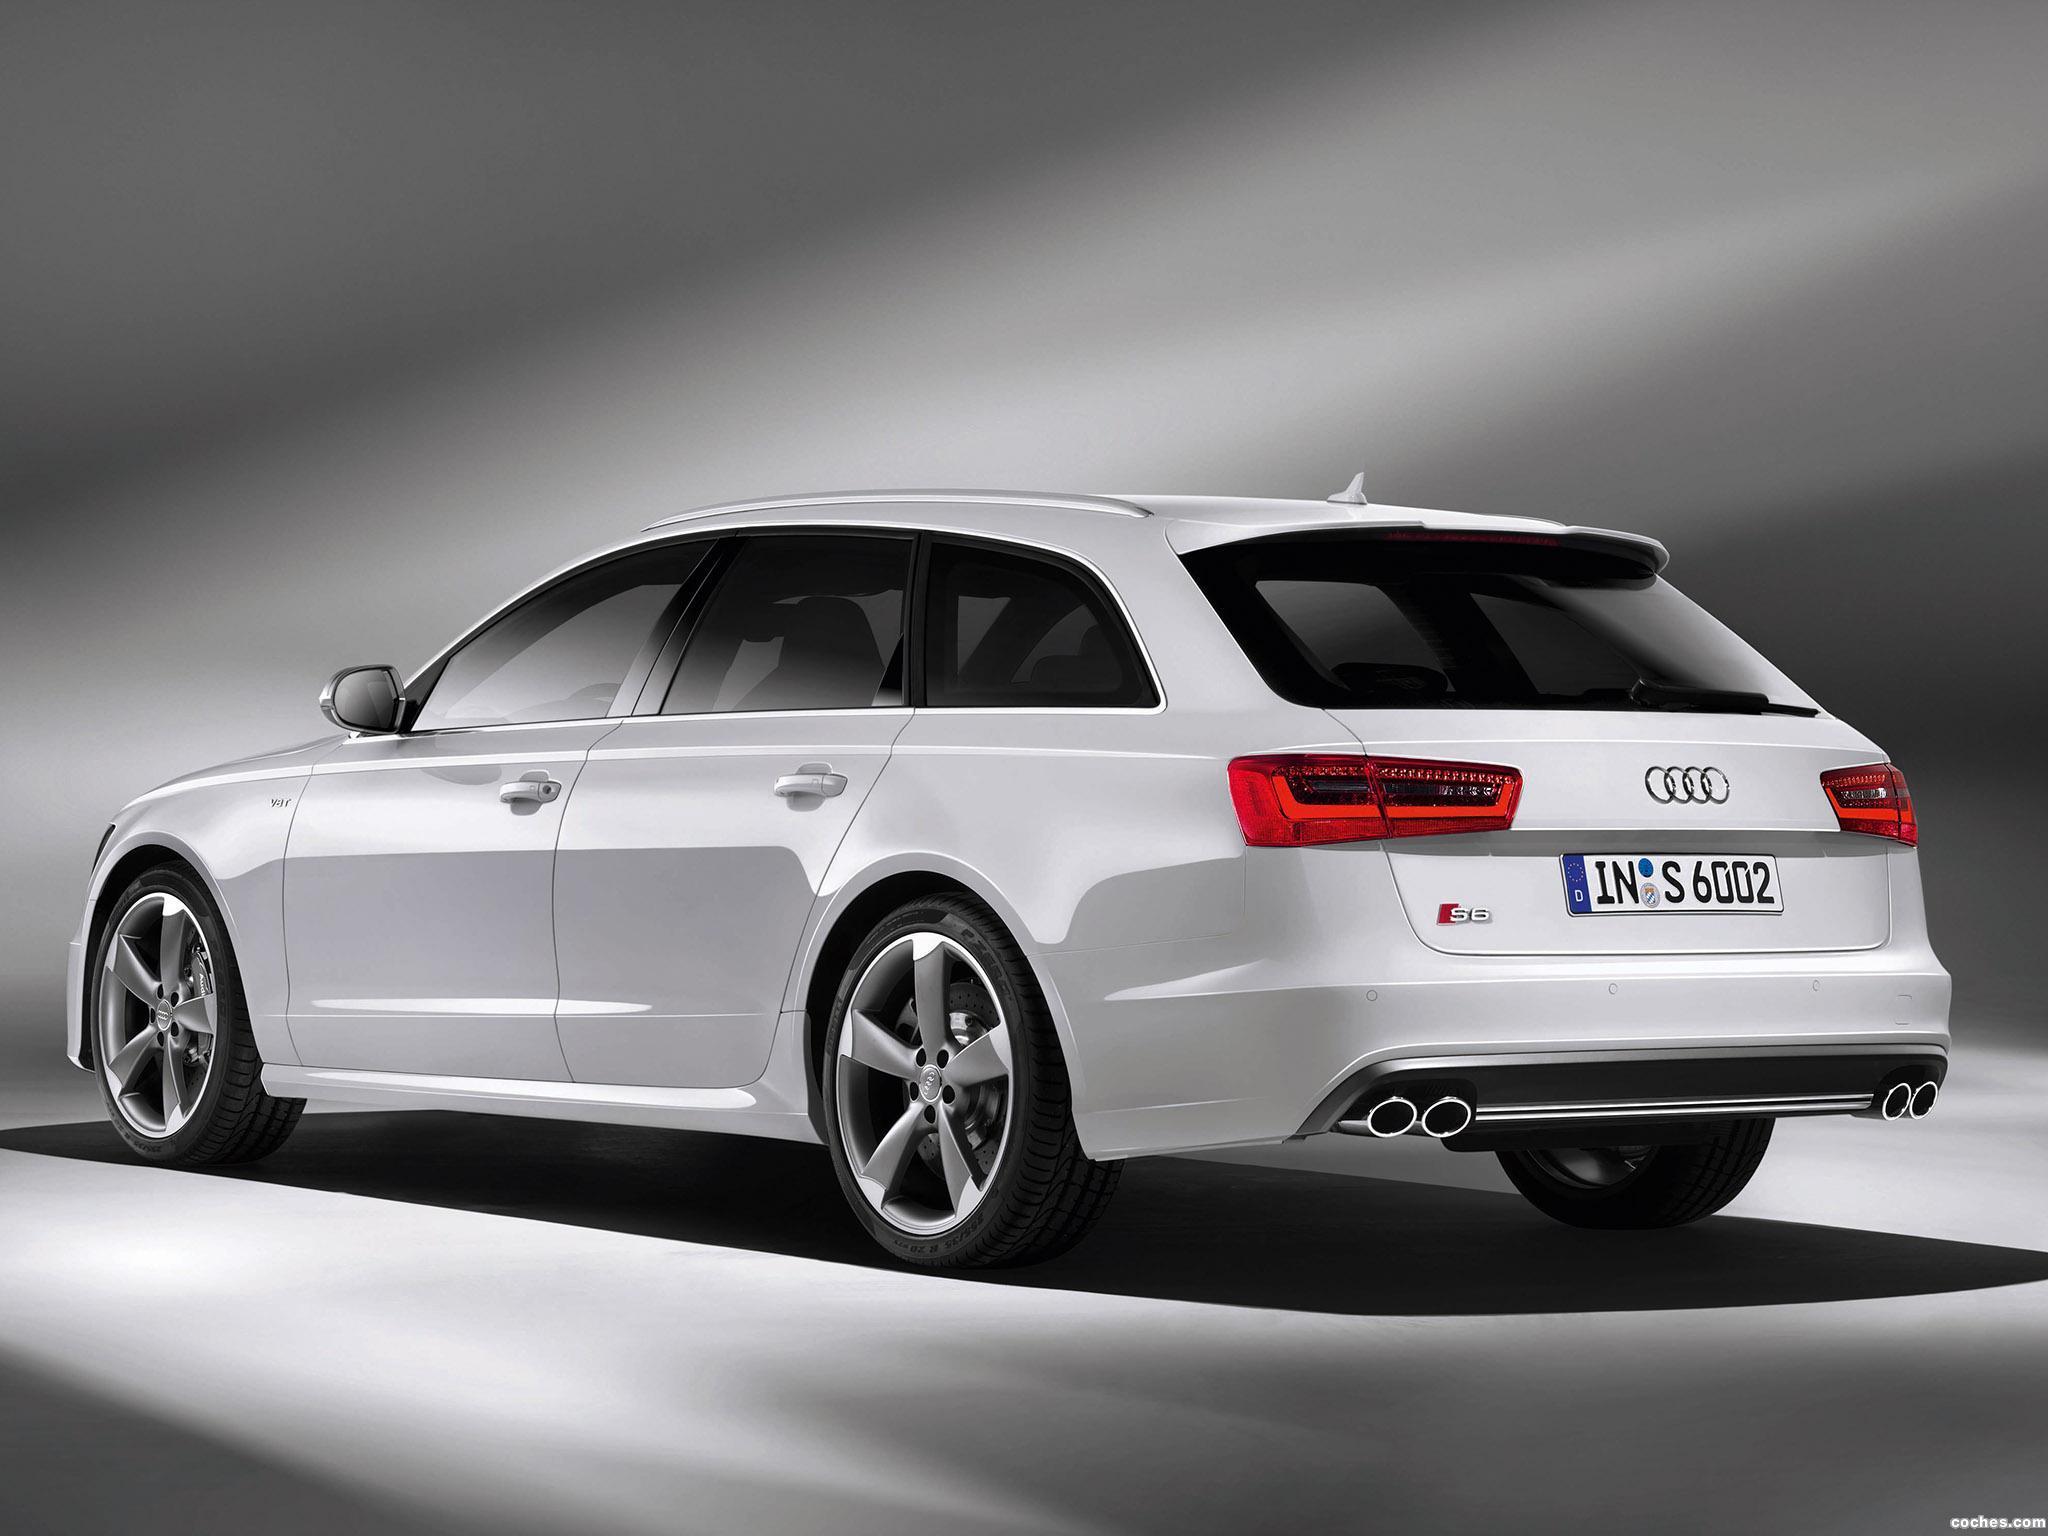 Foto 1 de Audi S6 Avant 2011